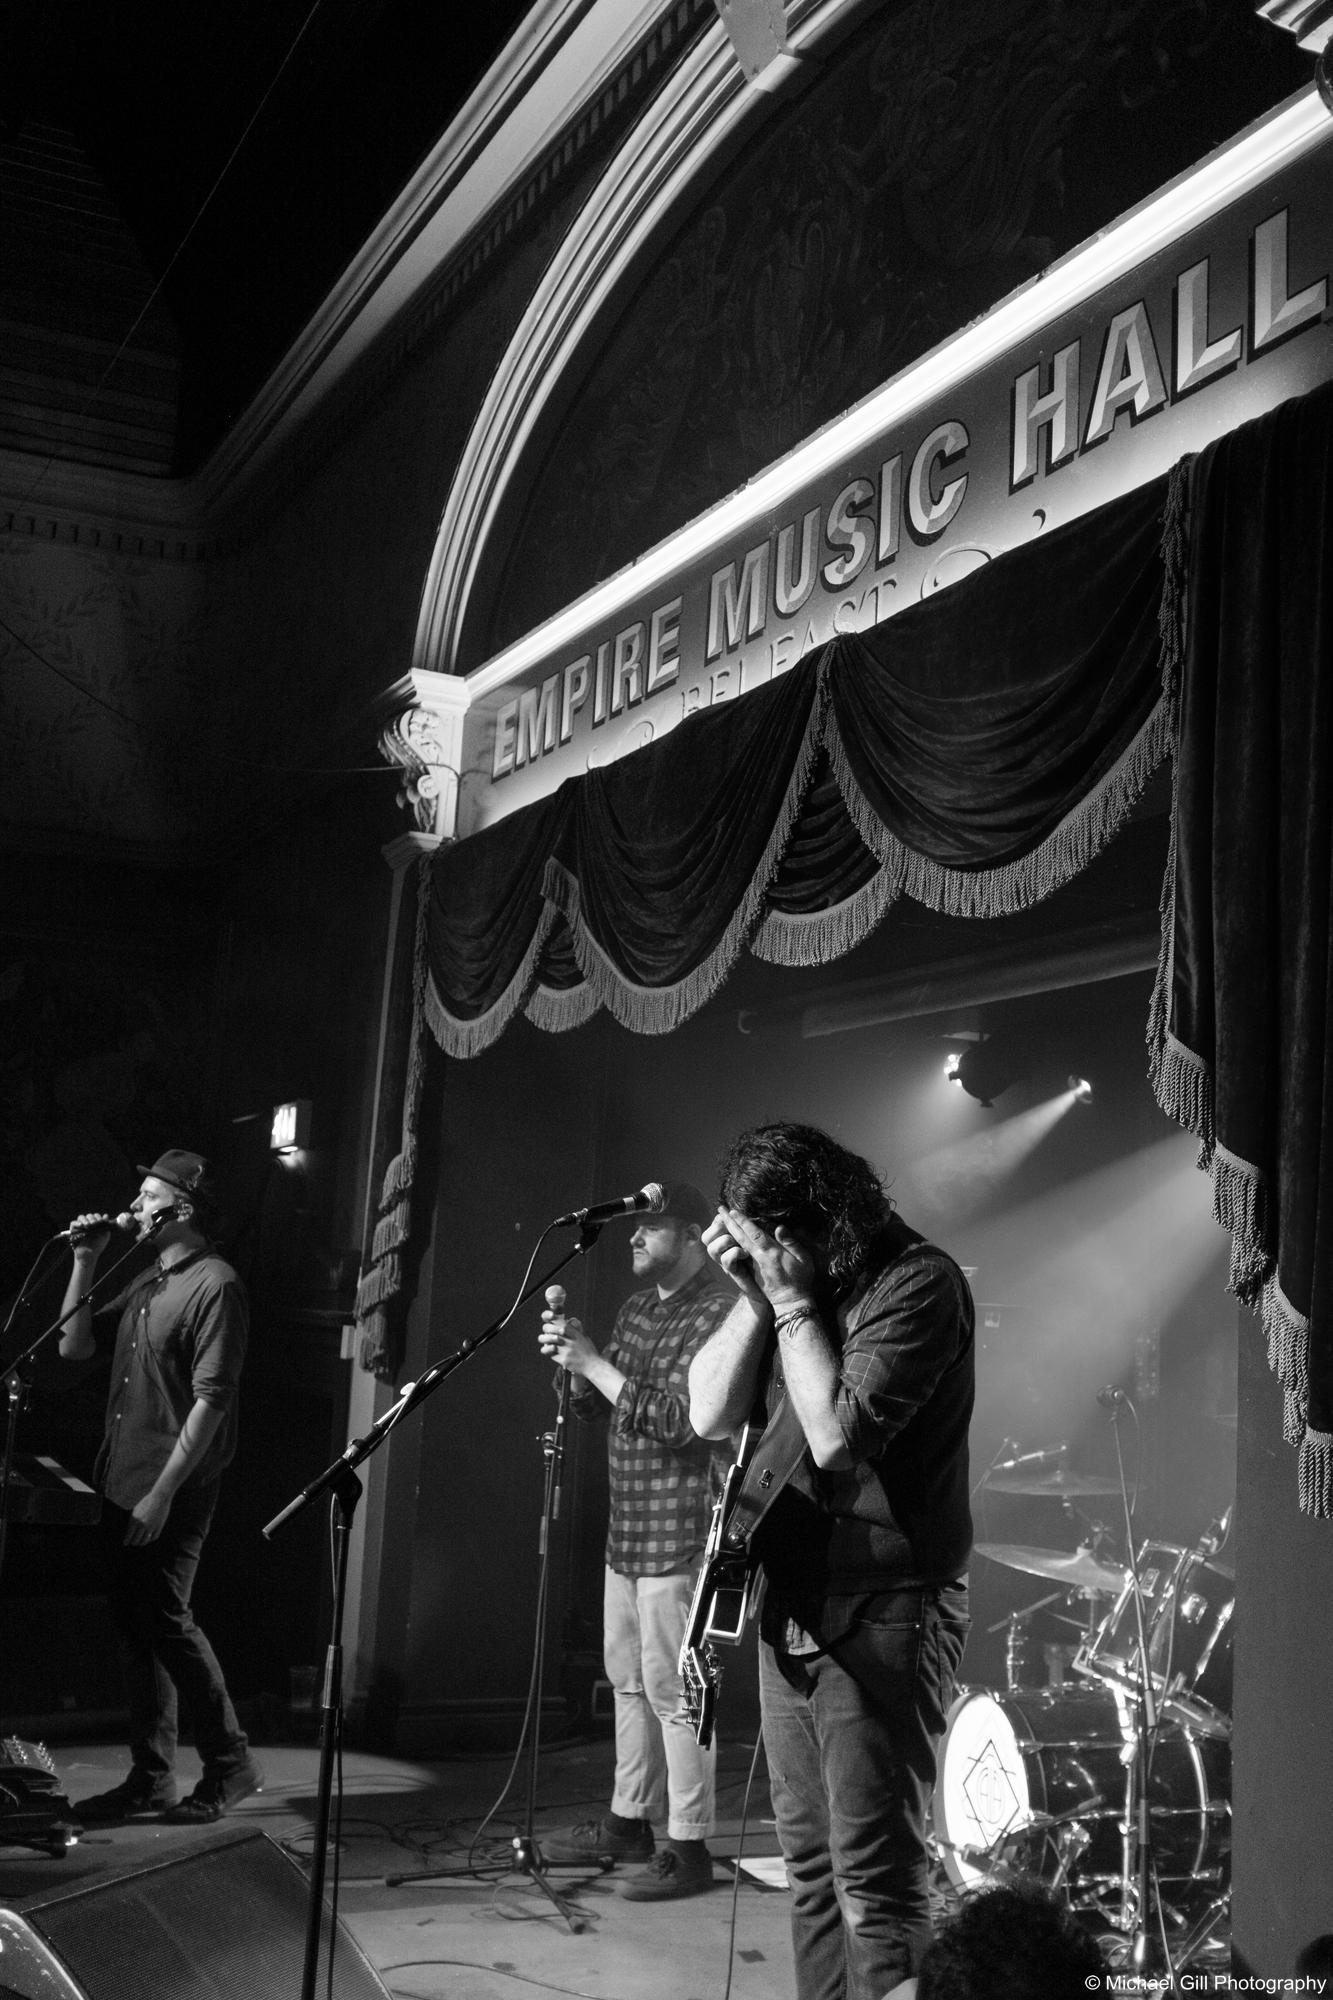 Michael_Gill_Photography_ Augustines_Empire_Belfast_6 (1).jpg